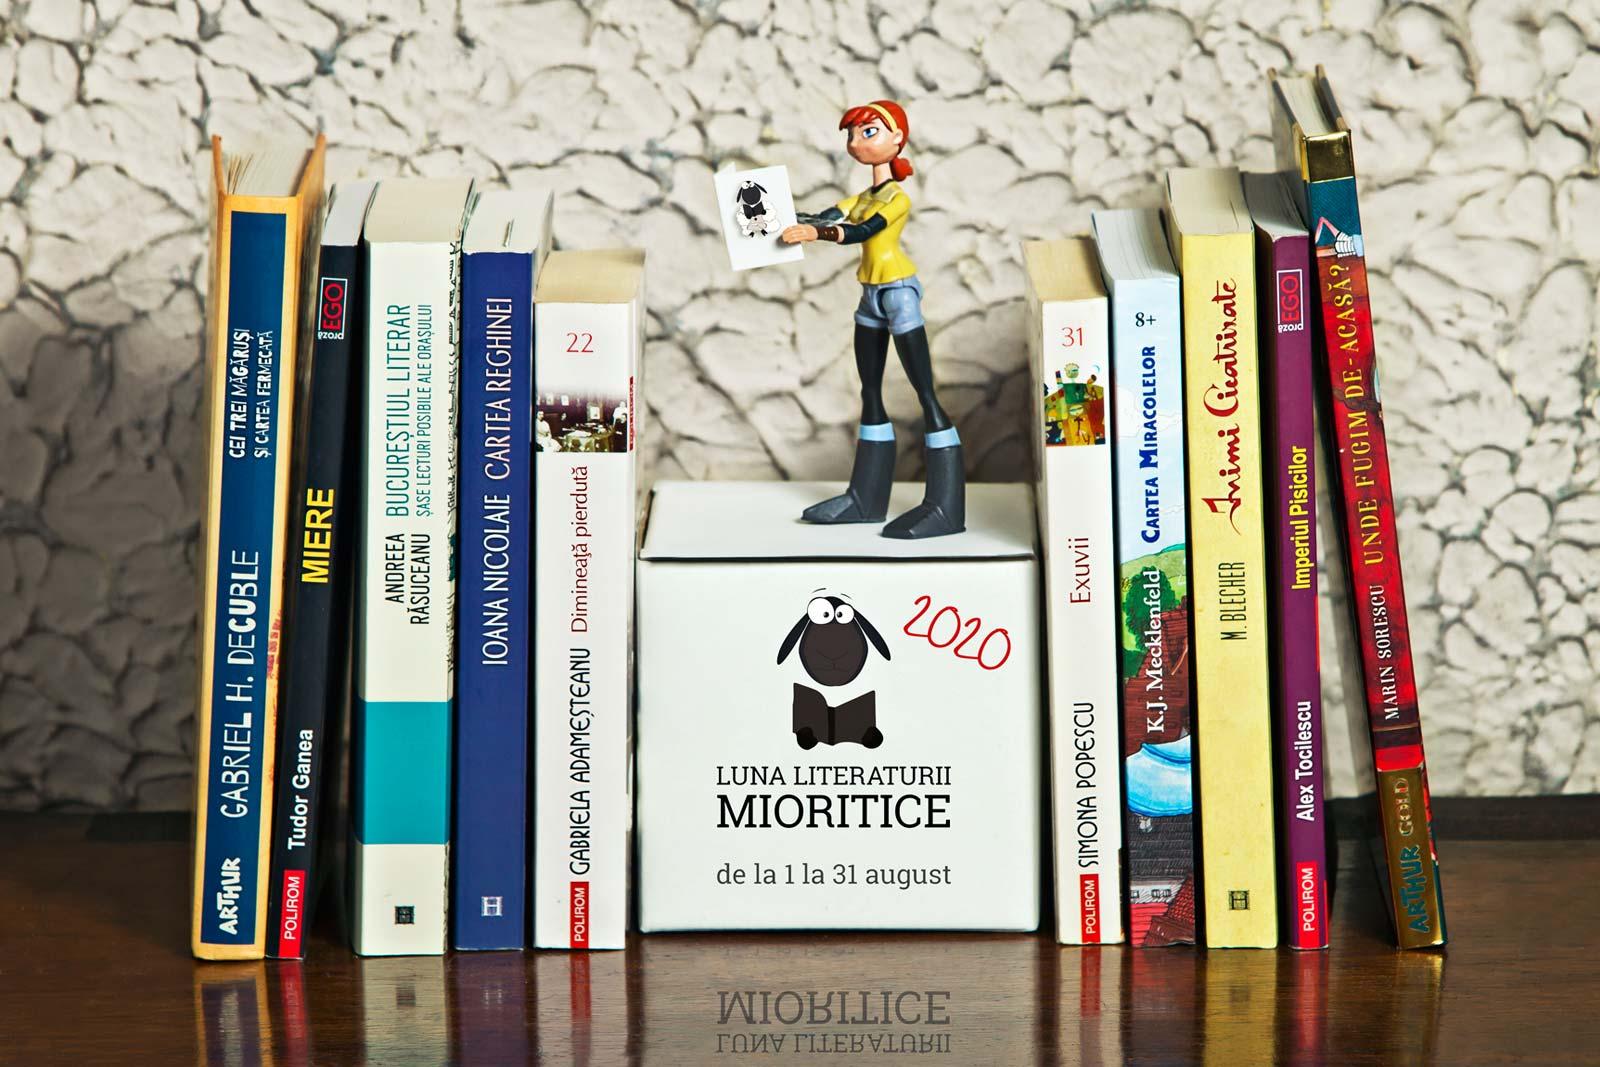 Luna literaturii mioritice 2020 autori romani